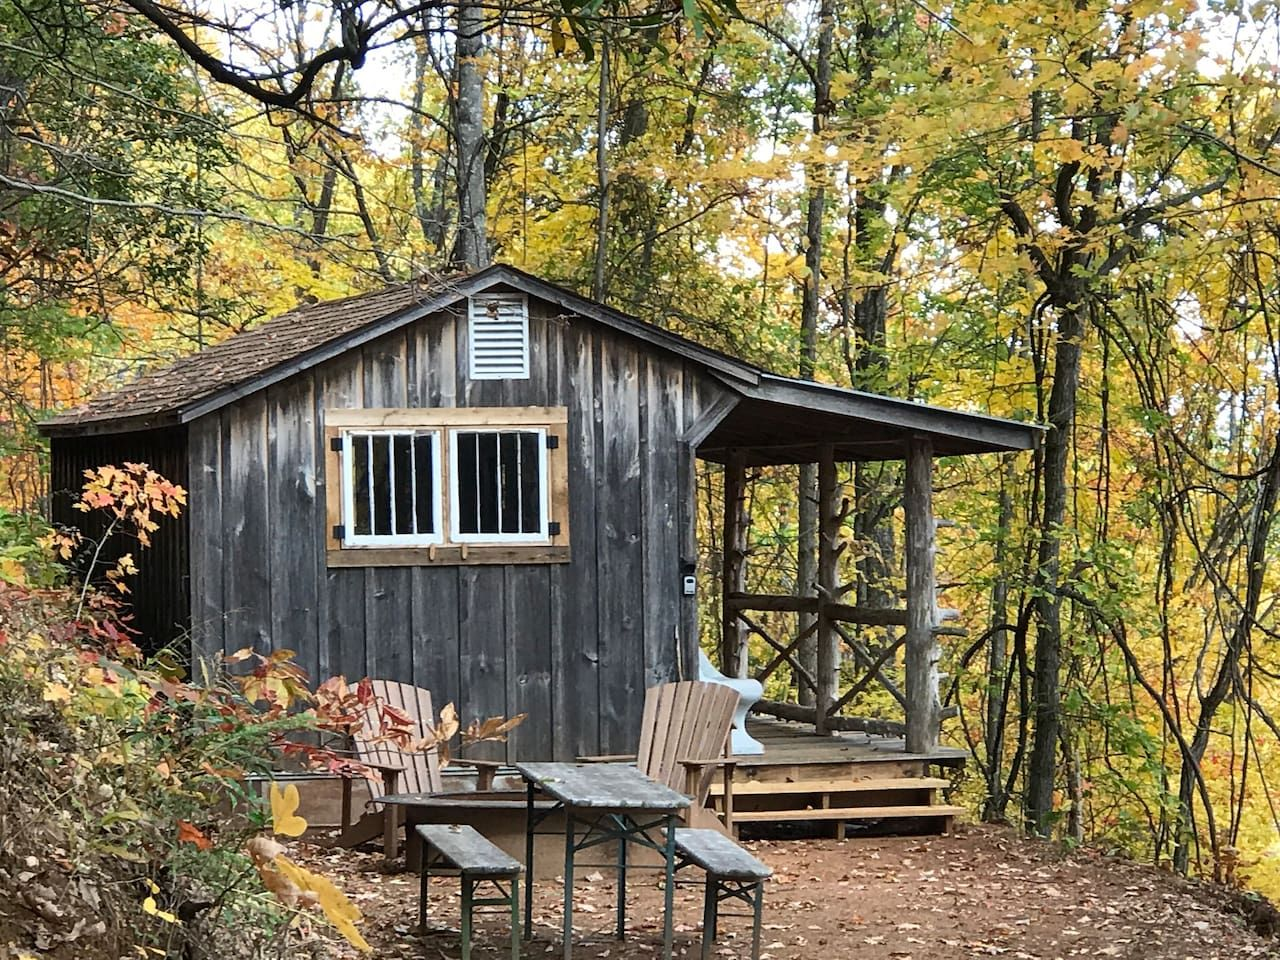 Pisgah Highlands Off Grid Cabin In The Woods Cottages For Rent In Candler North Carolina United Sta Cottage In The Woods Cabins In The Woods Off Grid Cabin